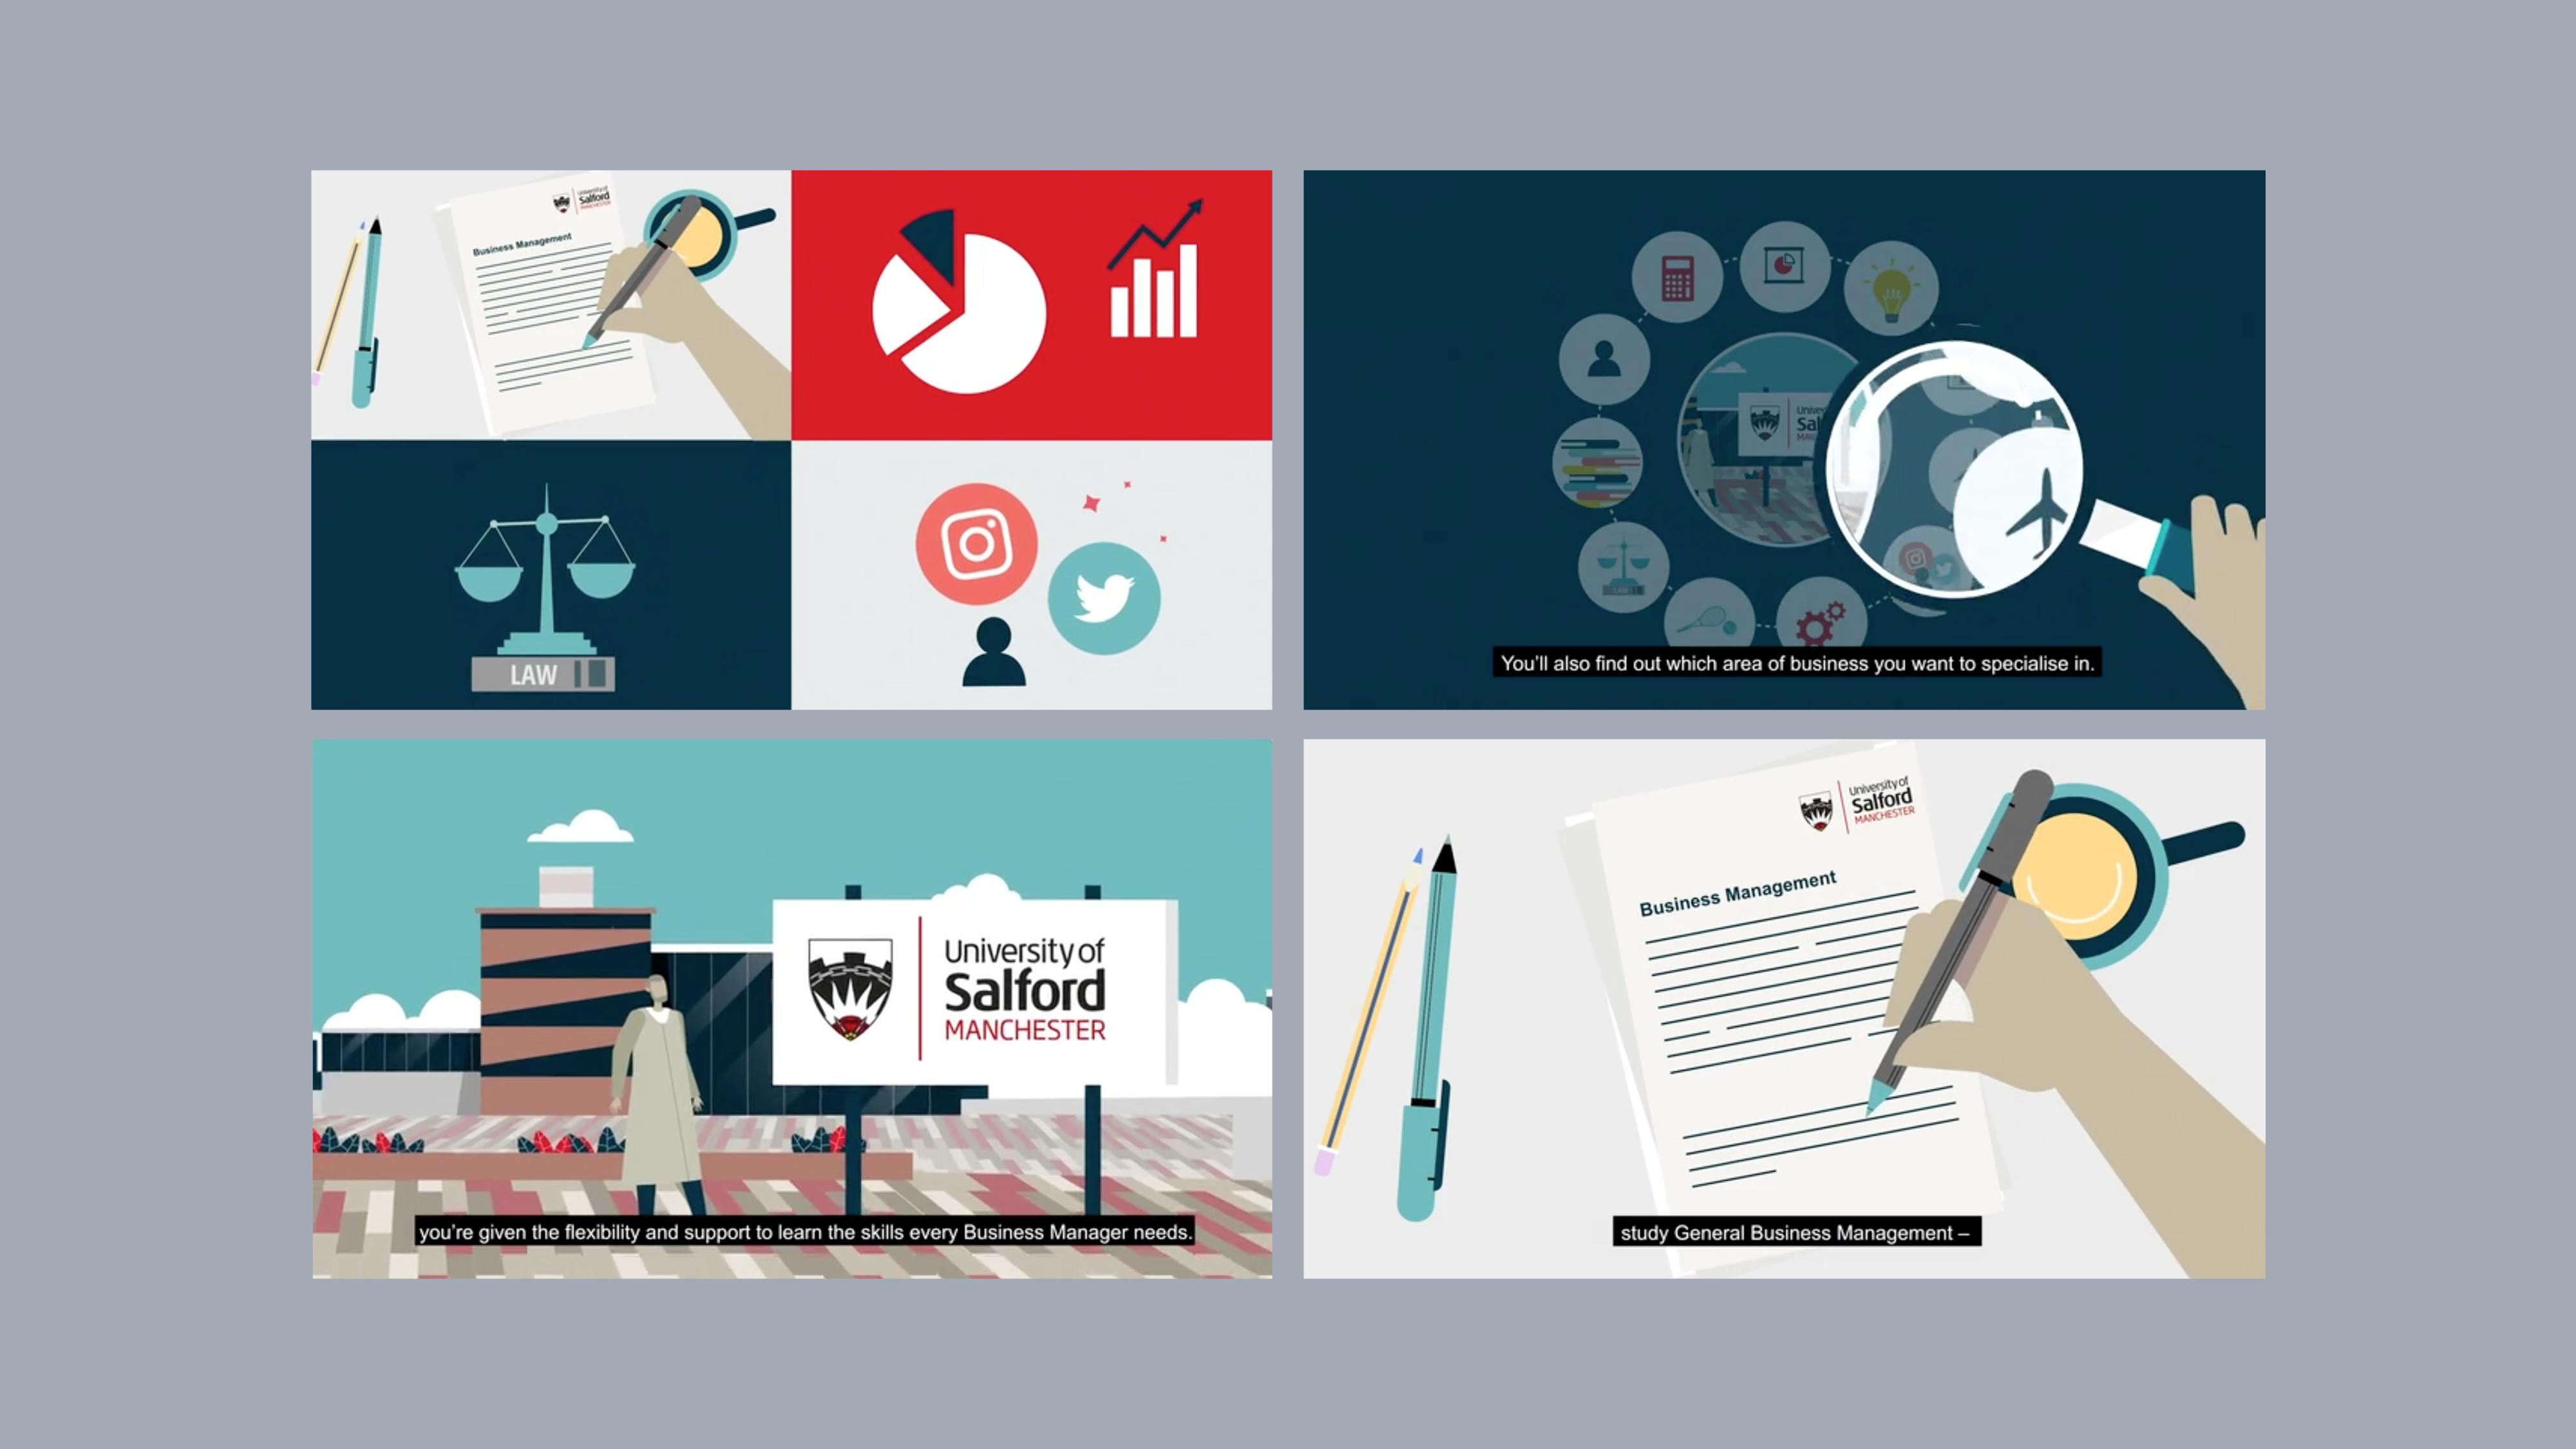 Salford business school animation_2